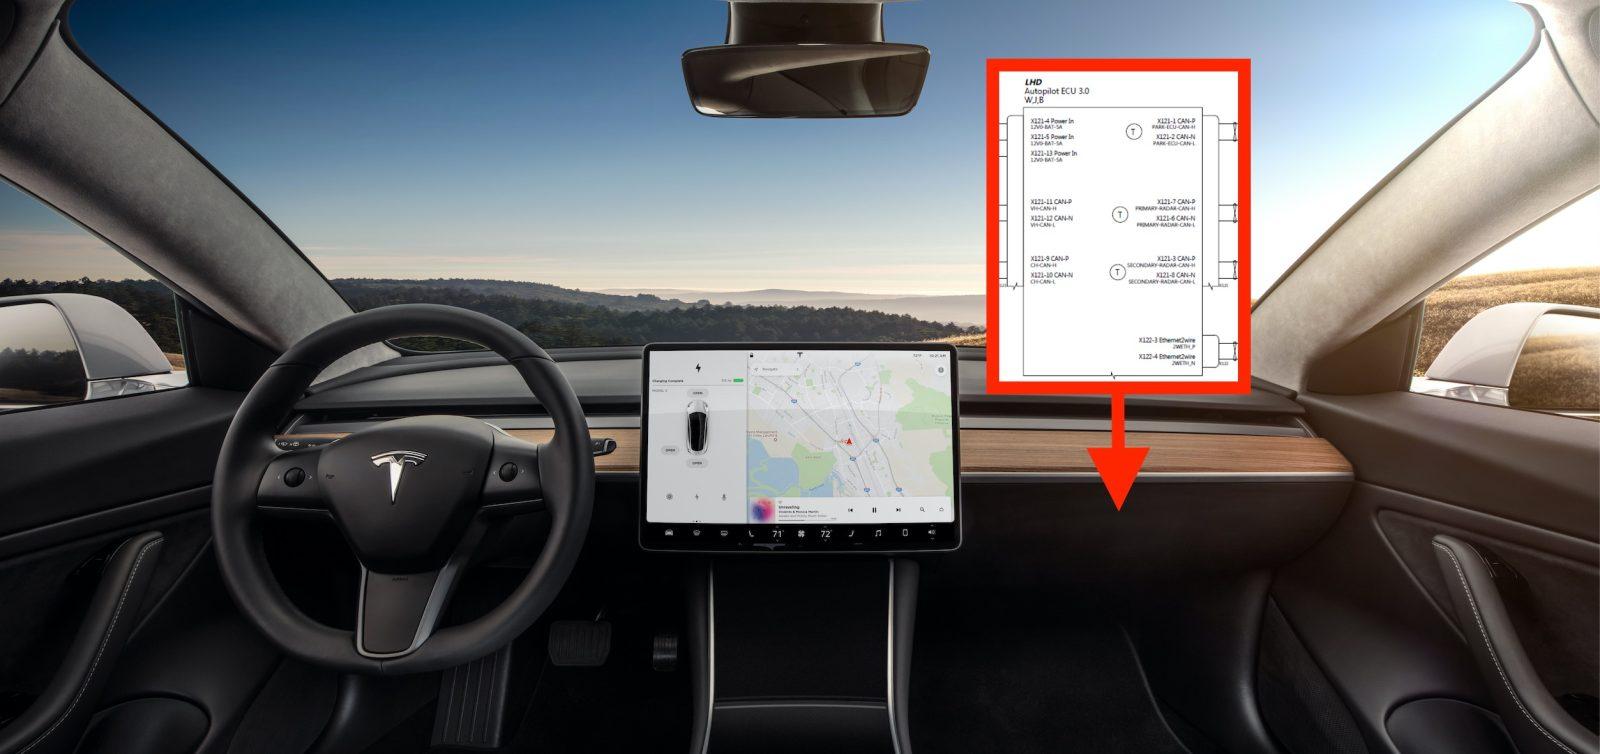 Tesla reveals new self-driving Autopilot hardware 3 0 computer